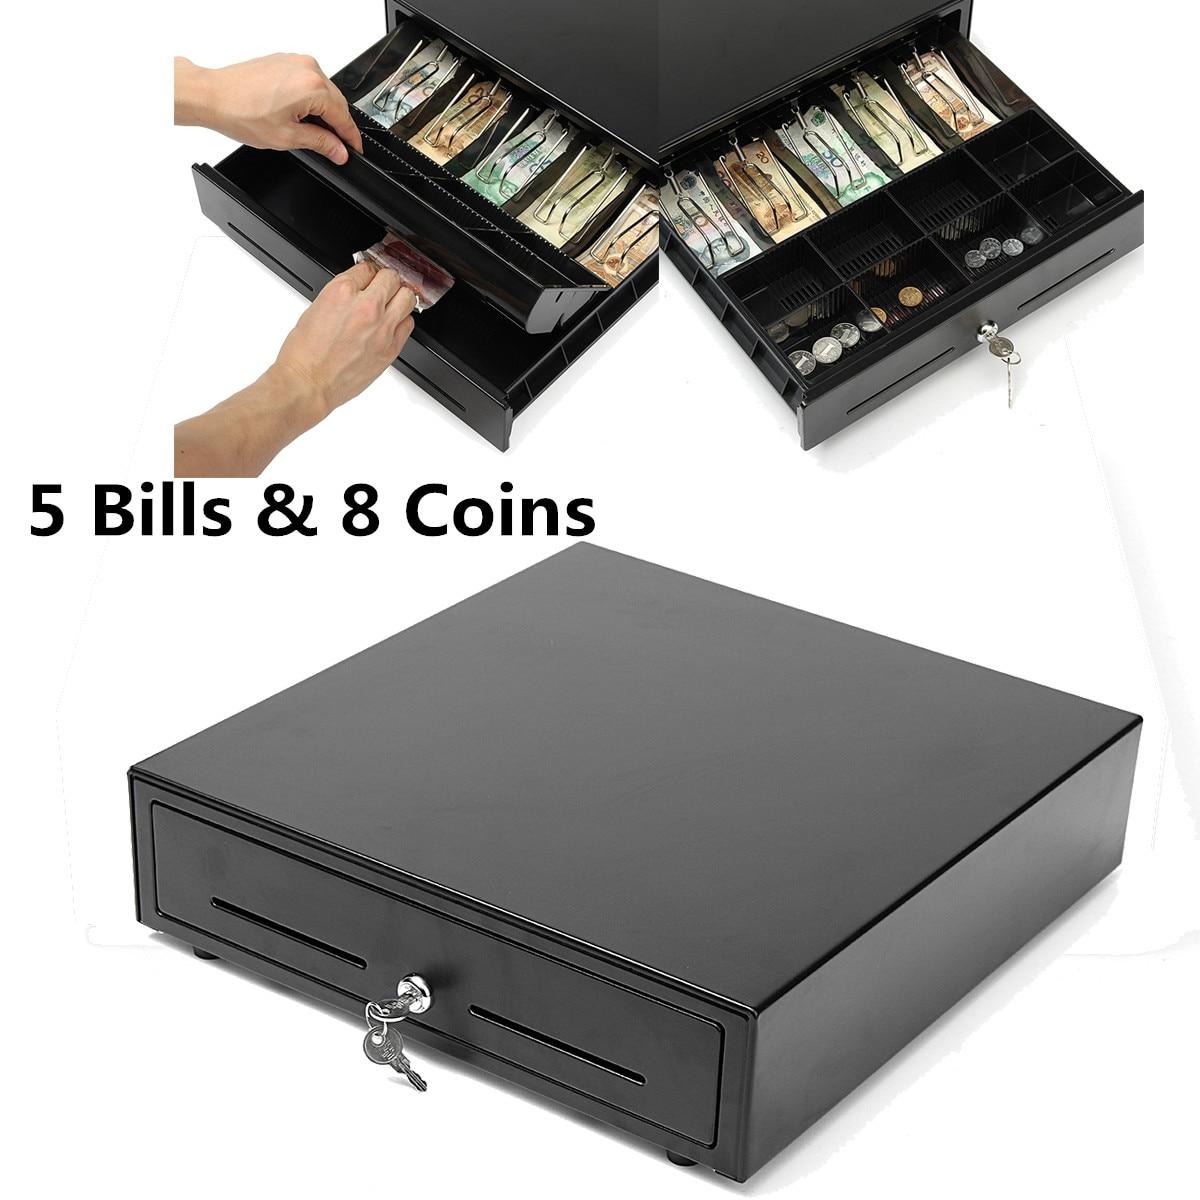 VK-4102 High Quality Cash Drawer Box Cash Register Compatible POS Printers Heavy Duty Key Lock 5 Bill 8 Coin Trays